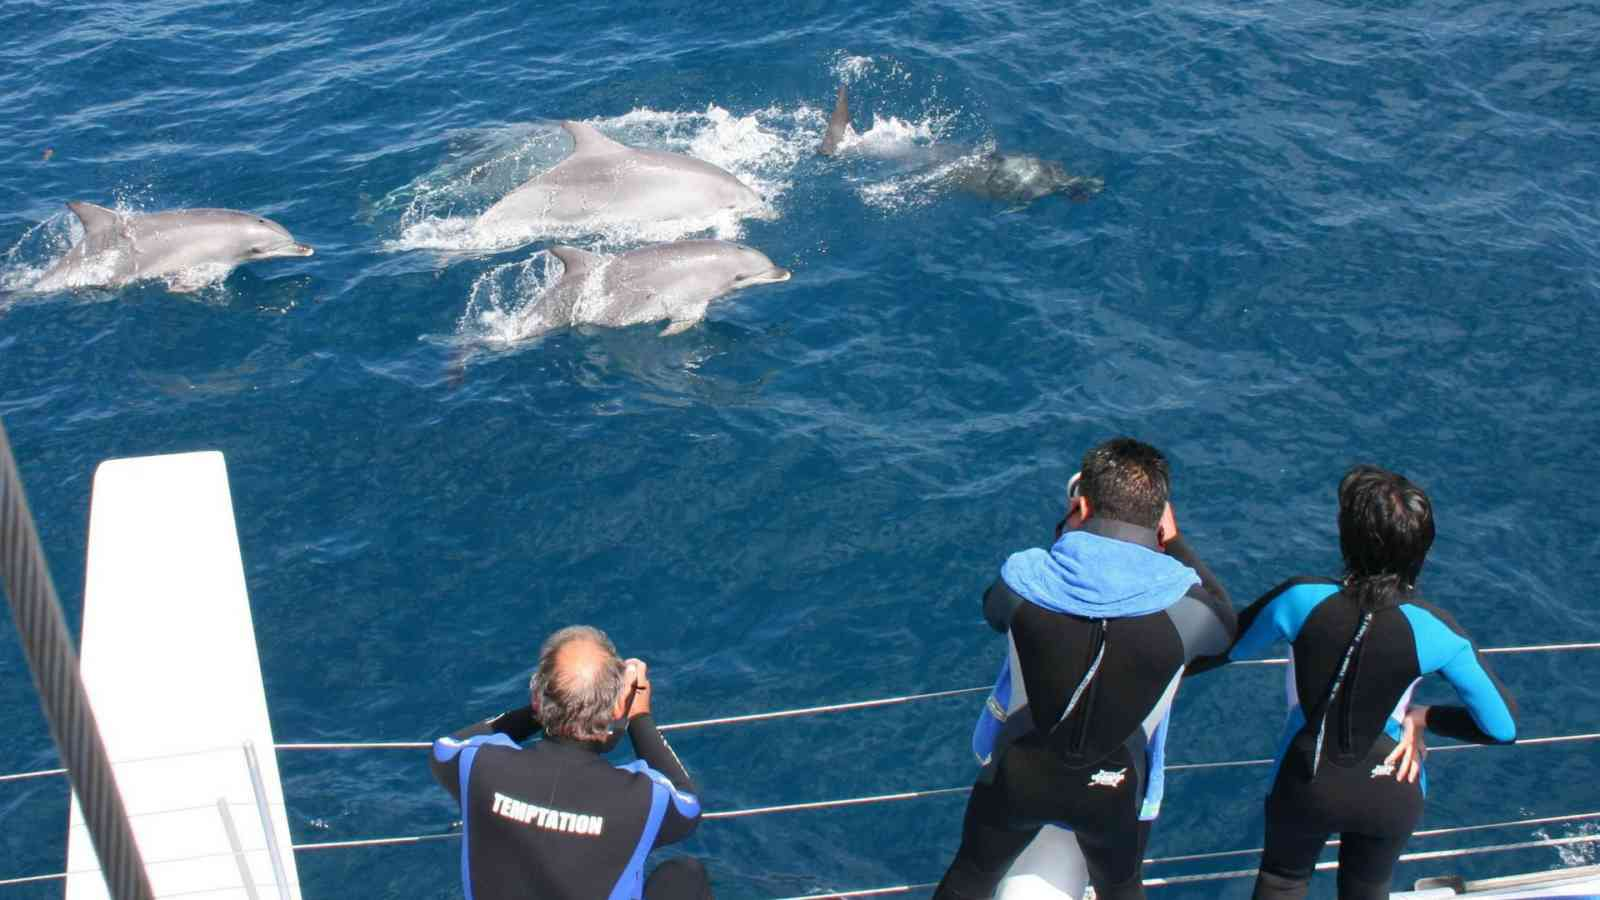 Temptation Dolphins